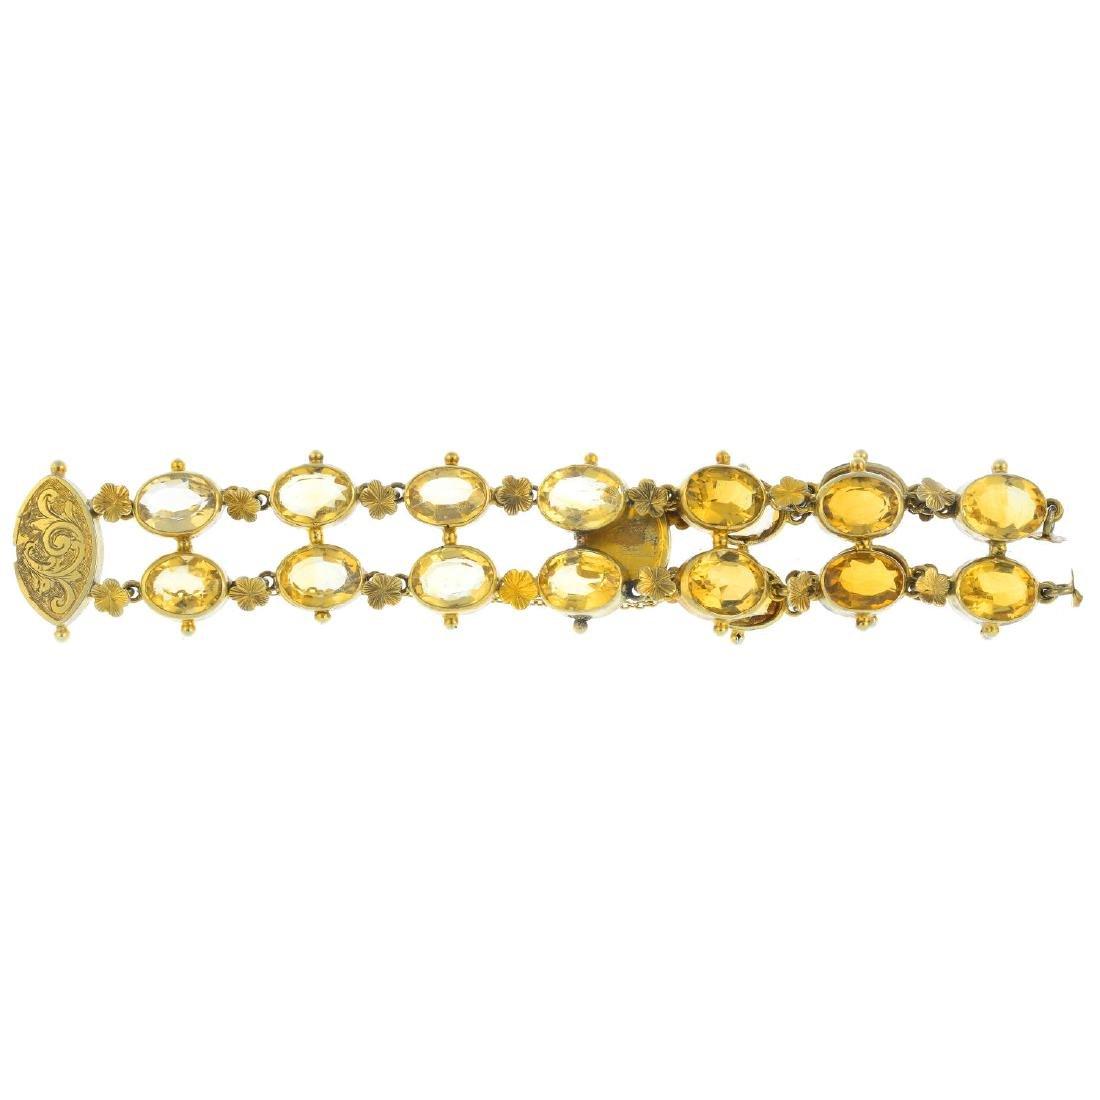 A citrine bracelet. Designed as a series of oval-shape